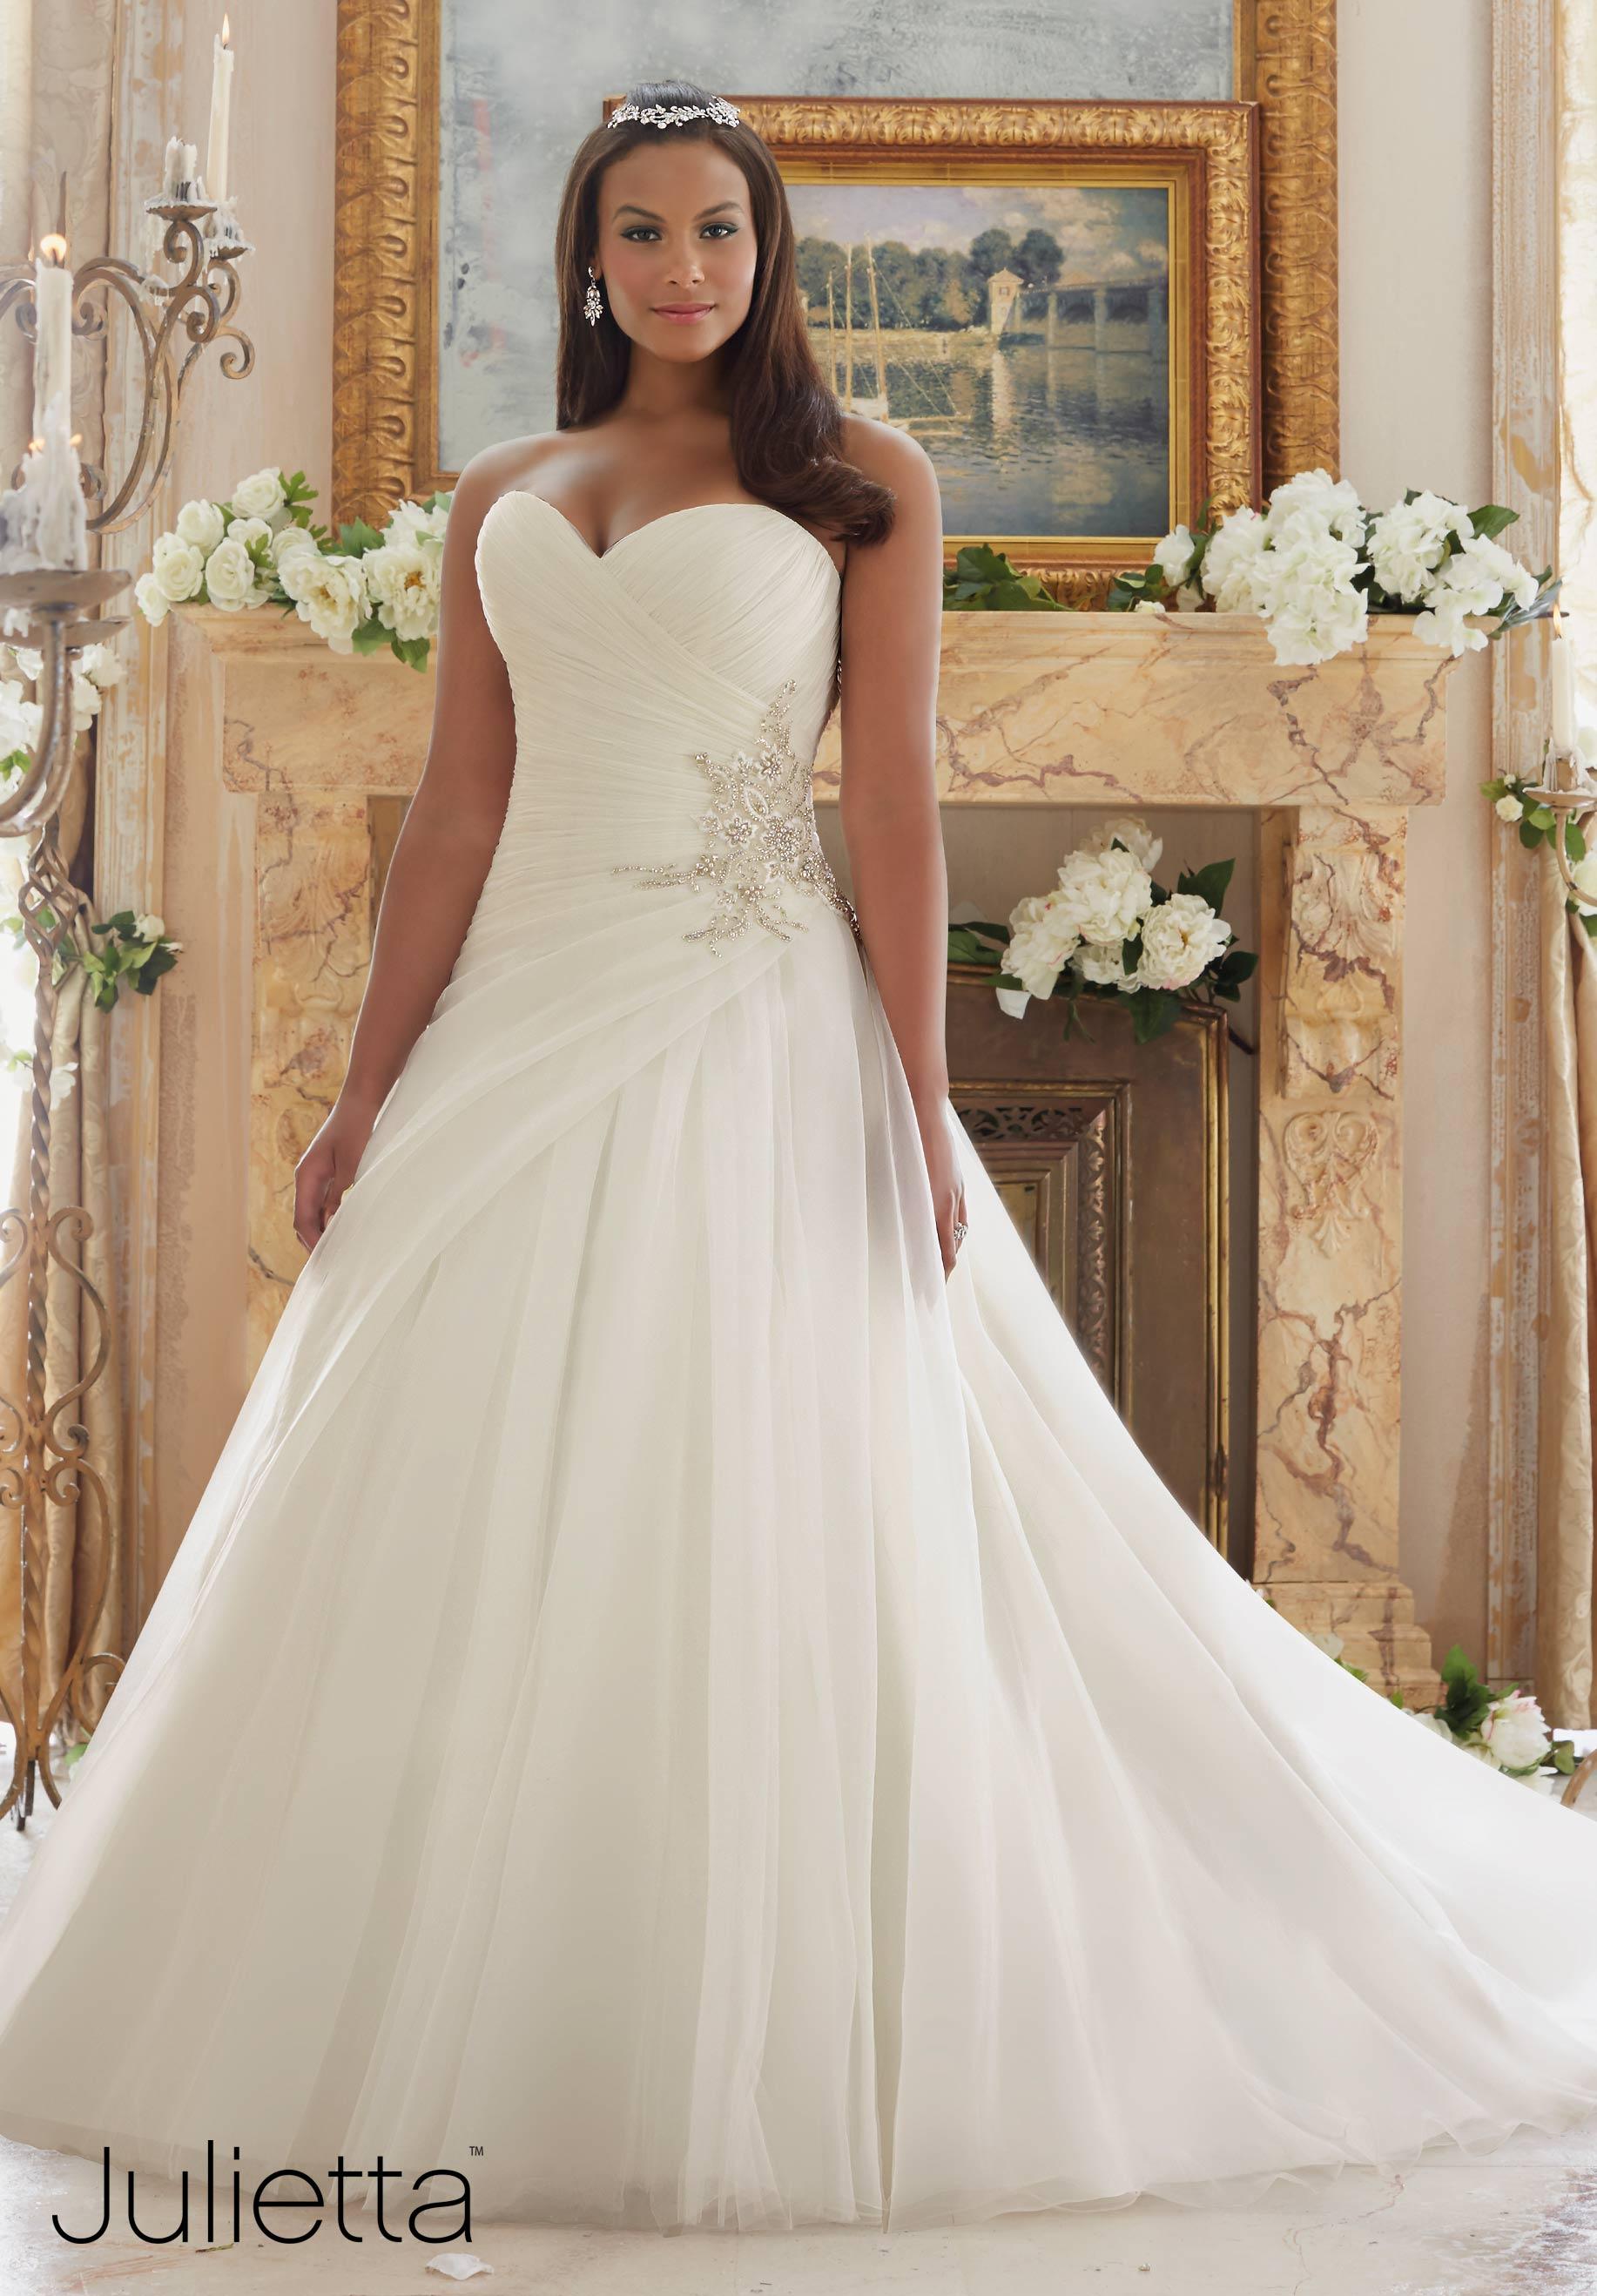 8453326 - Bridal Boutique Maryland